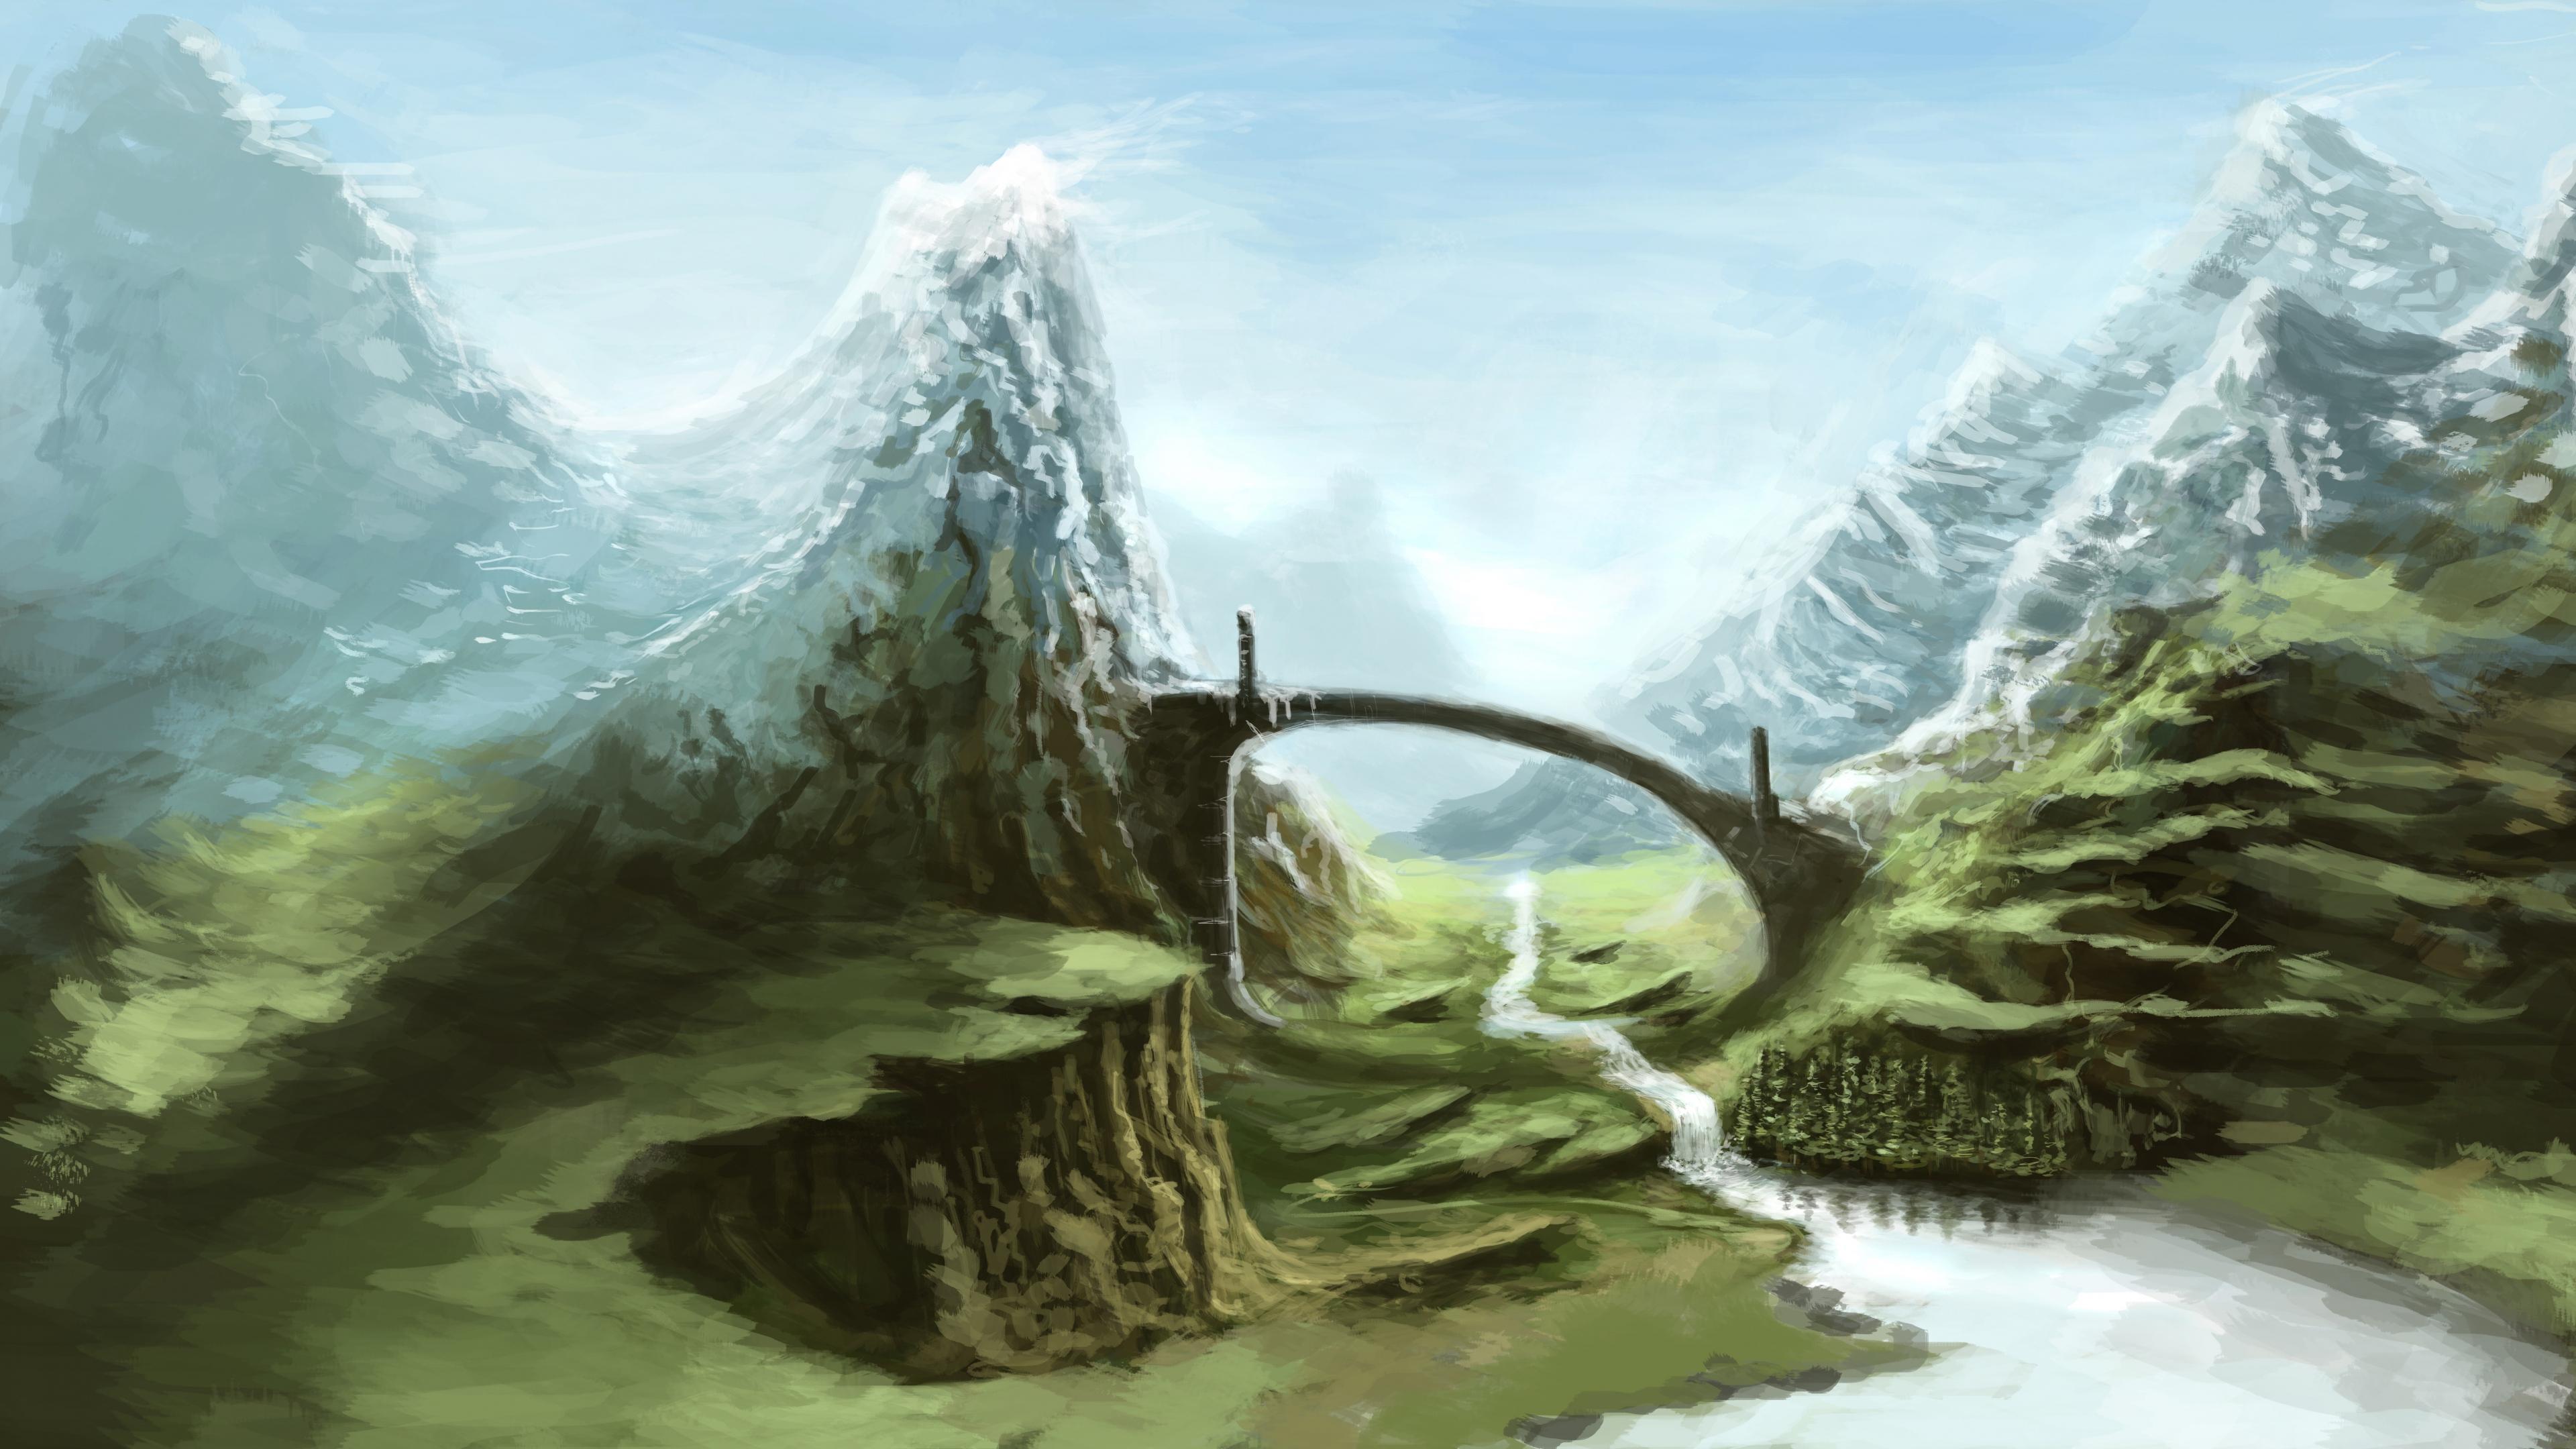 Download Wallpaper 3840x2160 Skyrim Nature Art 4K Ultra HD HD 3840x2160